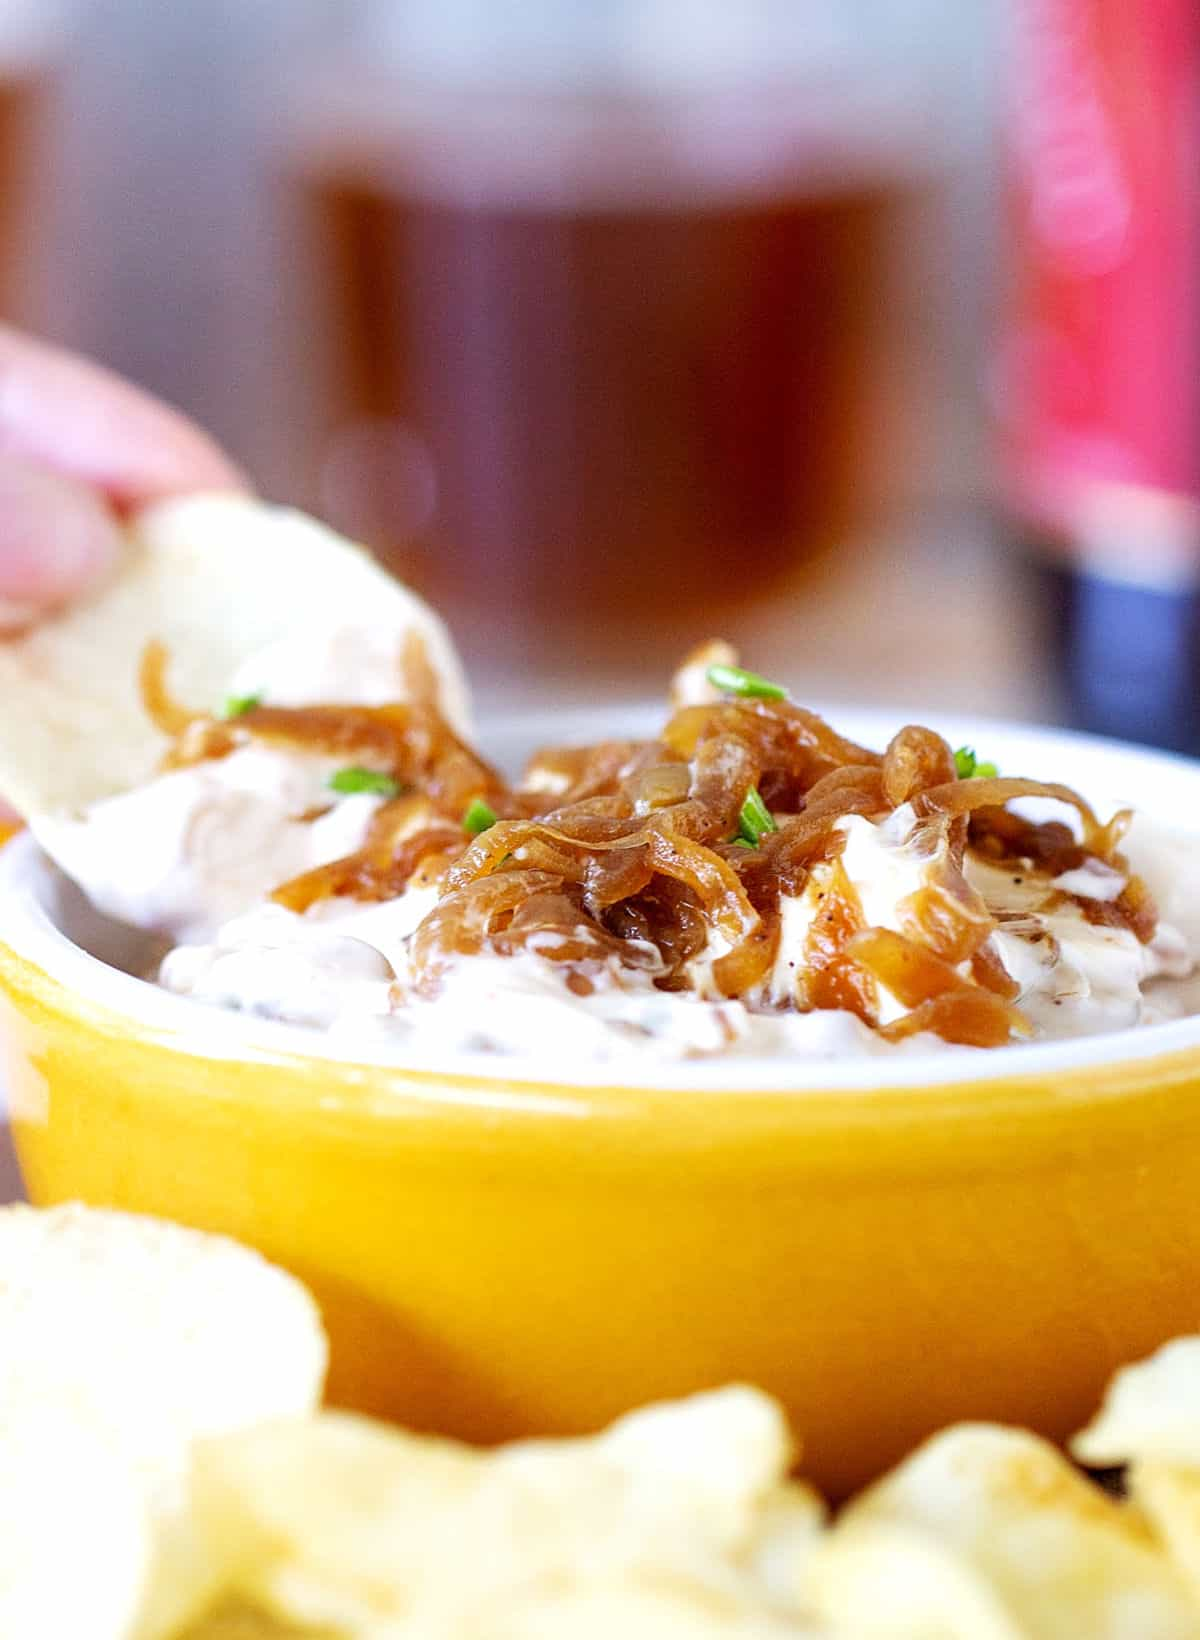 Potato chips and beer surrounding yellow ramekin with onion dip